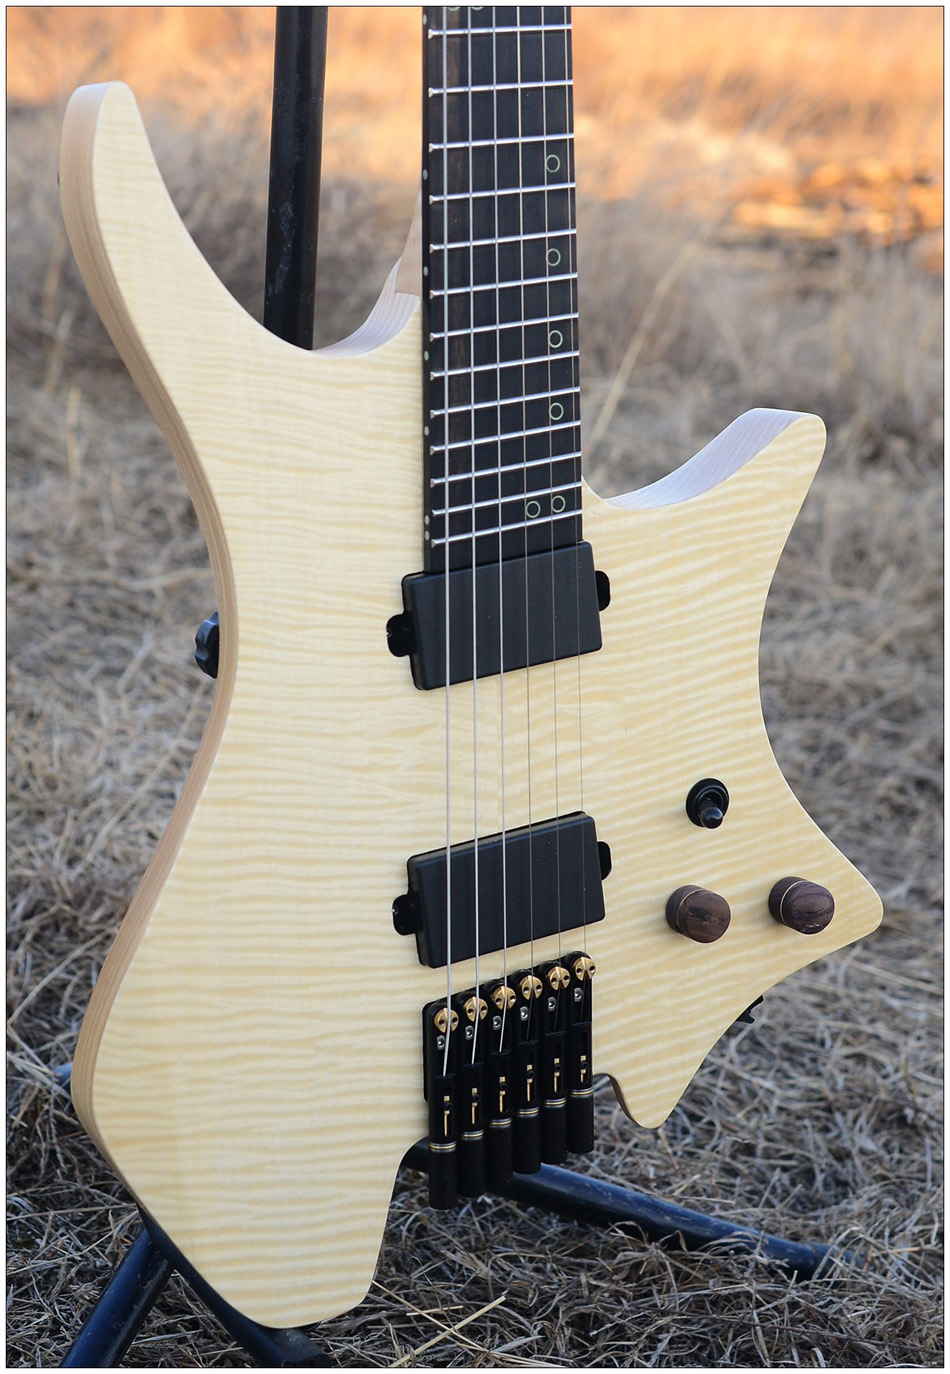 2019 NK sin avivado trastes guitarra eléctrica claro llama Arce superior llama cuello de arce diapasón de ébano negro hardware guitarra